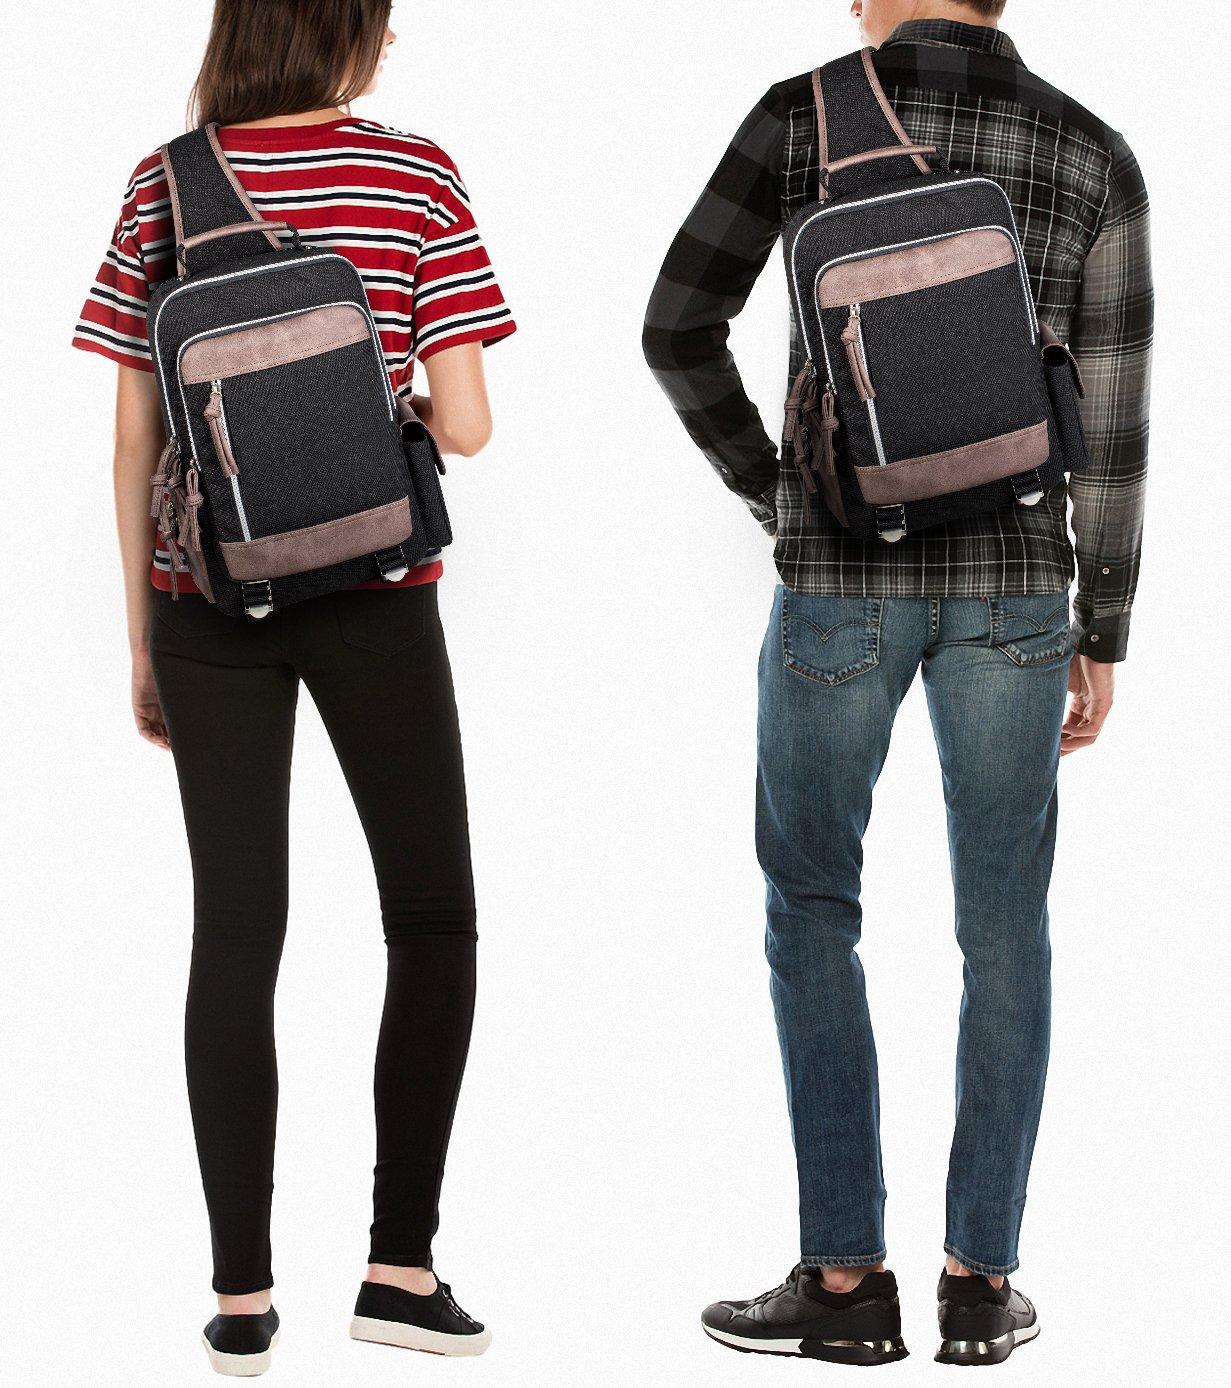 Leaper Retro Messenger Bag Outdoor Cross Body Sling Bag Travel Bag Shoulder Backpack (Black3103) by Leaper (Image #6)